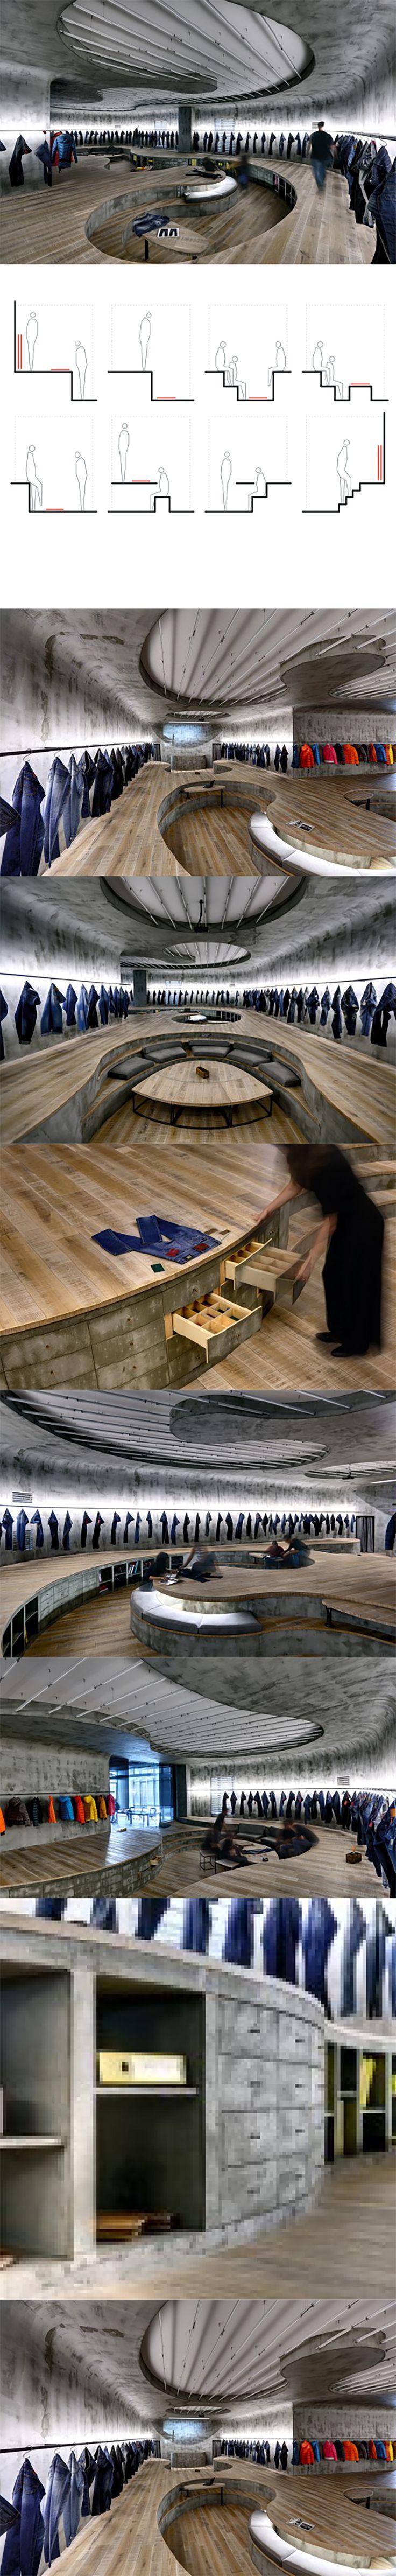 Amazing denim store delienated by a sunken floor/ curved ceiling. Vigoss R & D / Zemberek Design Office